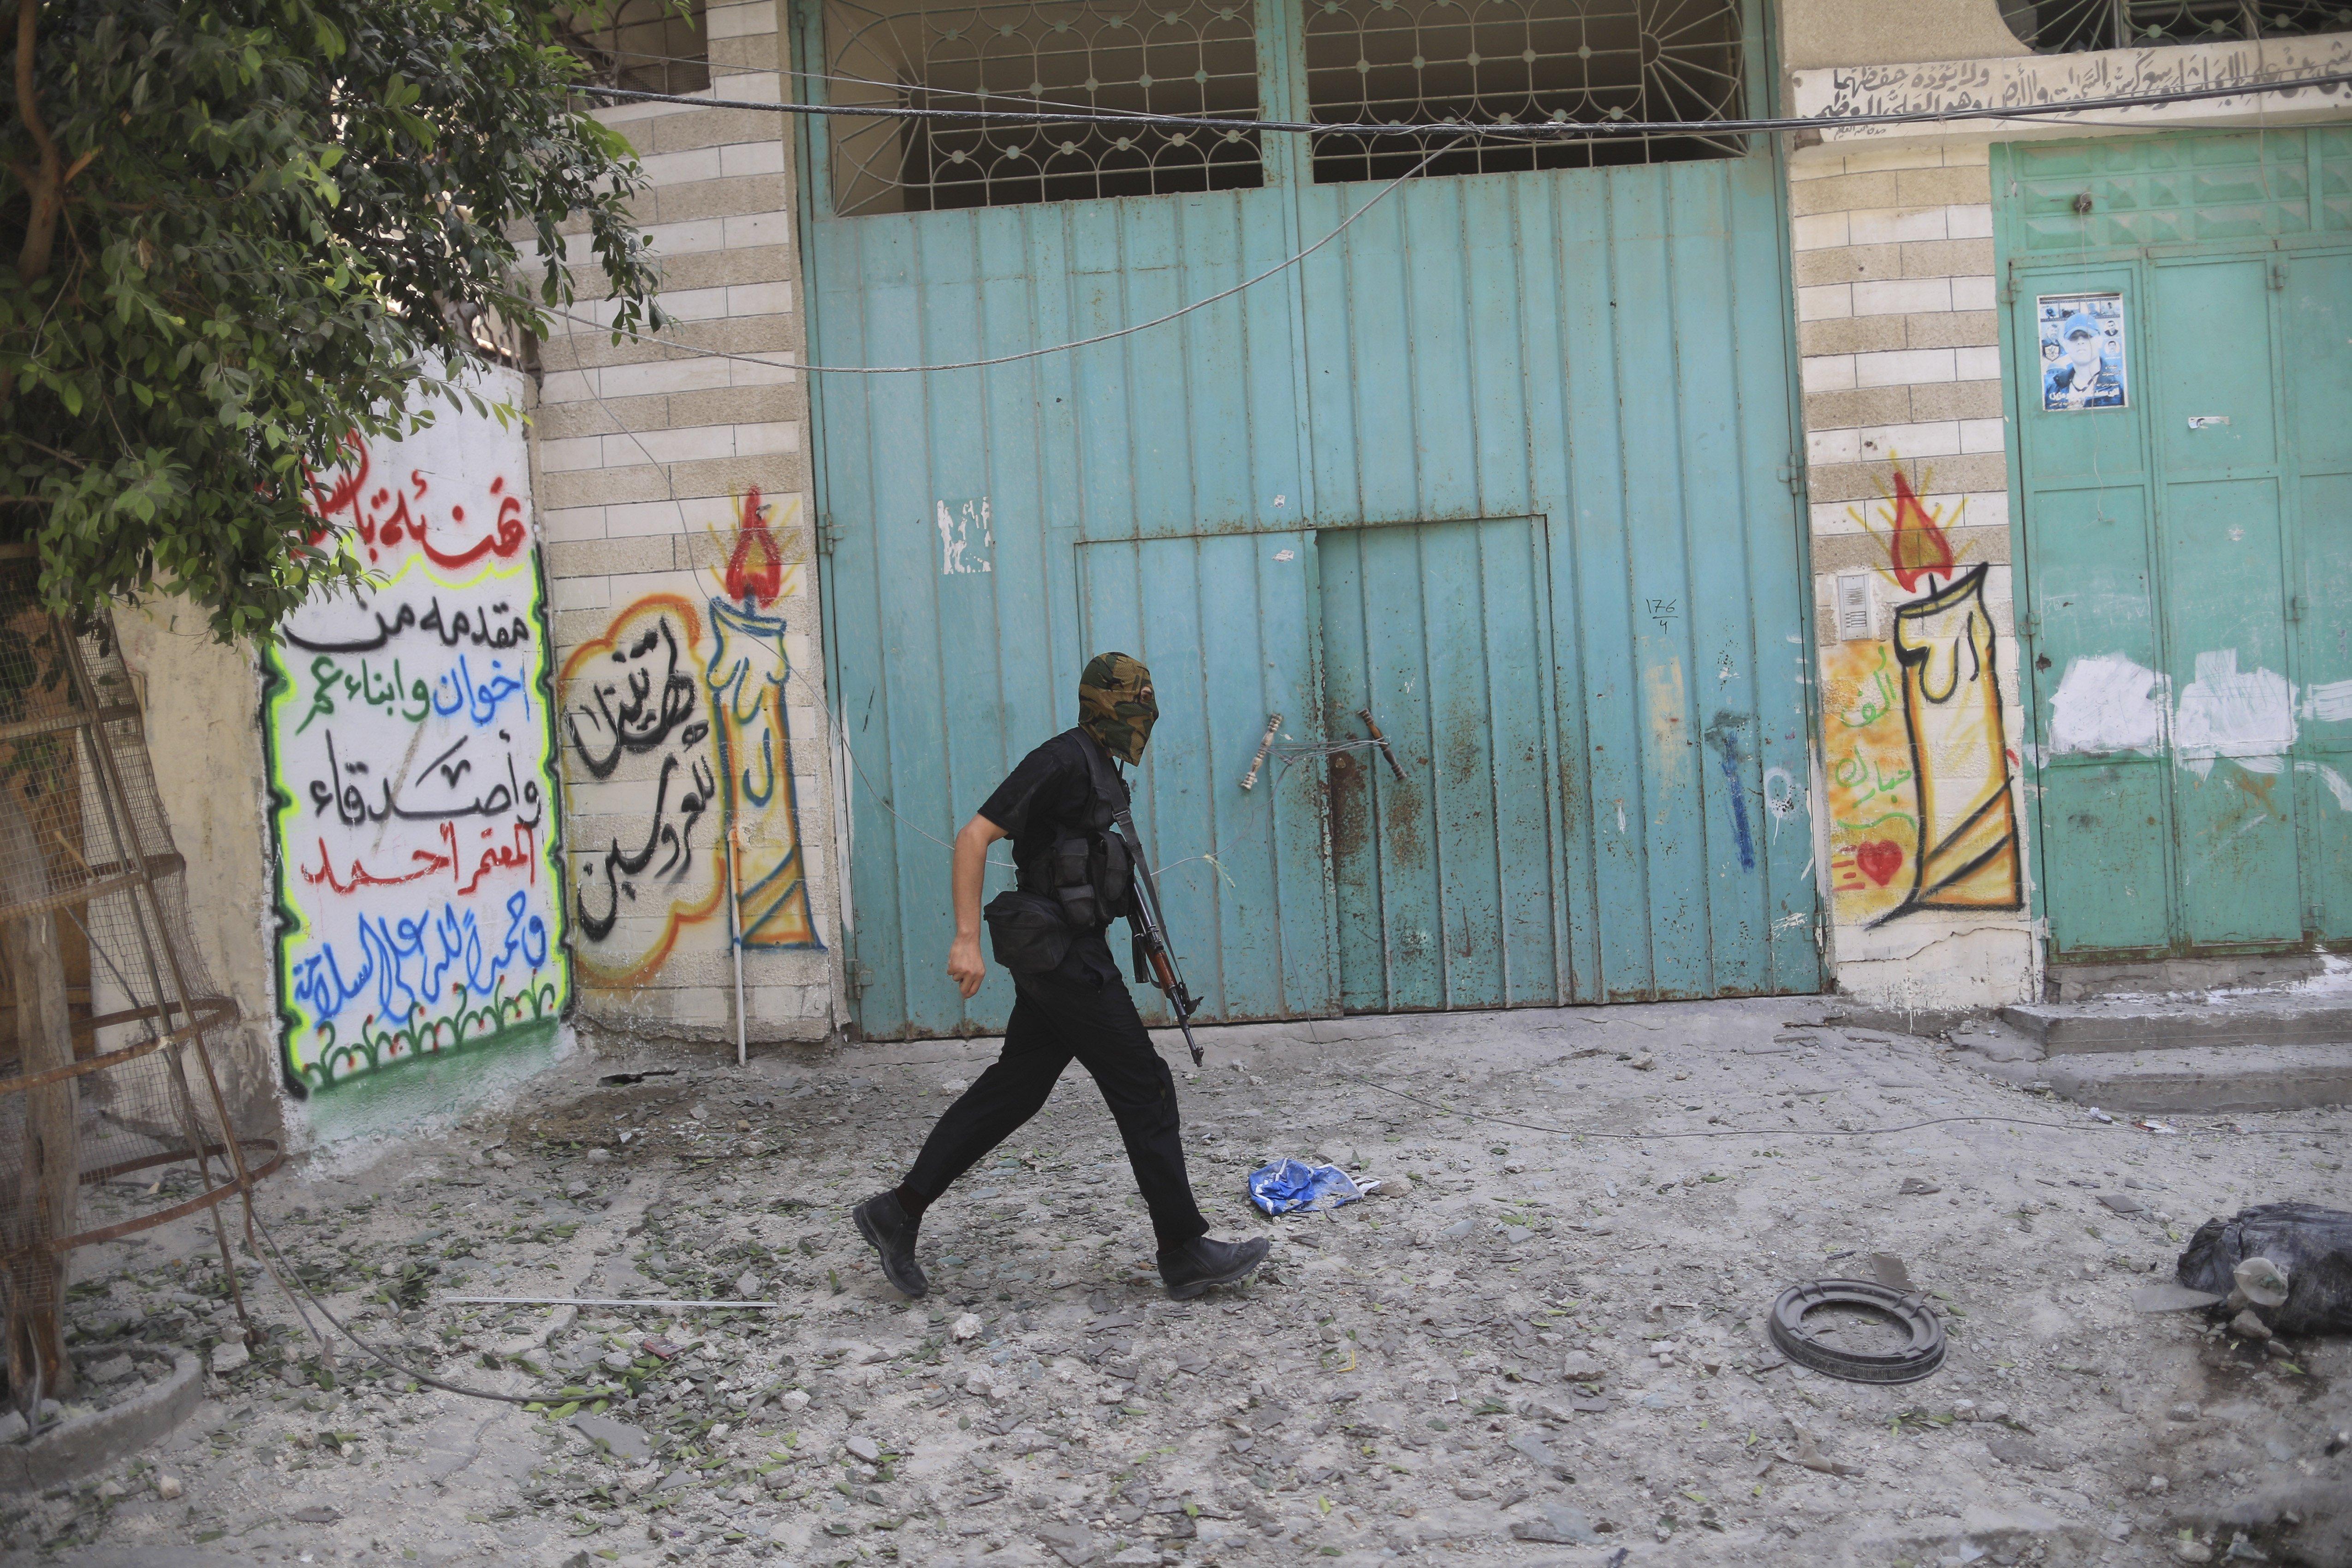 An armed Hamas militant walks through a street in the Shejaiya neighborhood of Gaza City on July 20, 2014.